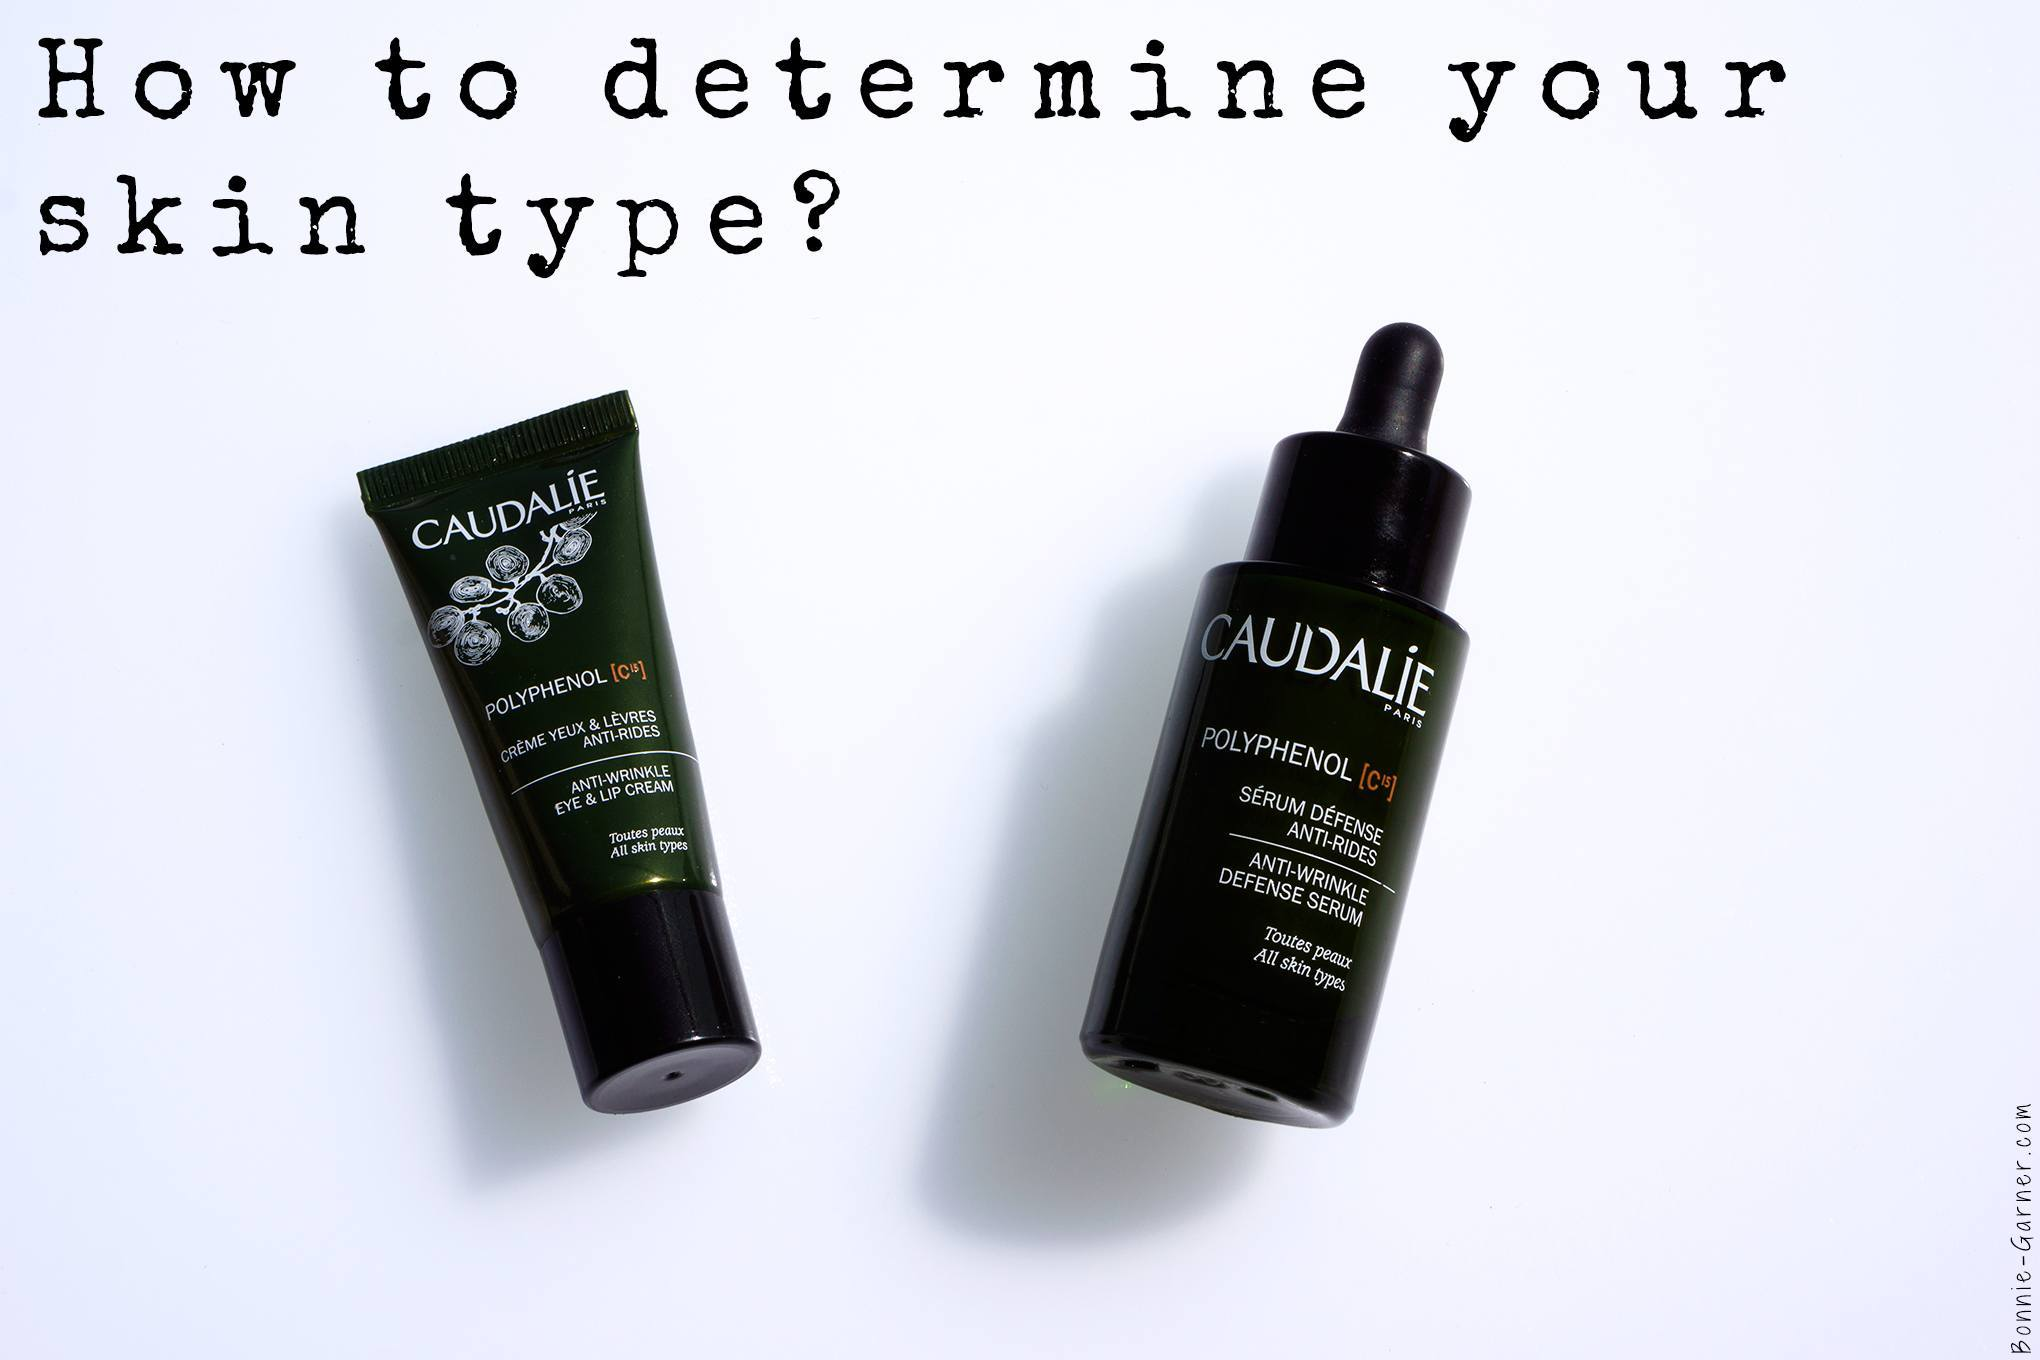 Eye brushes: MakeupGeek, Sephora 28, Real Techniques, MAC, Zoeva